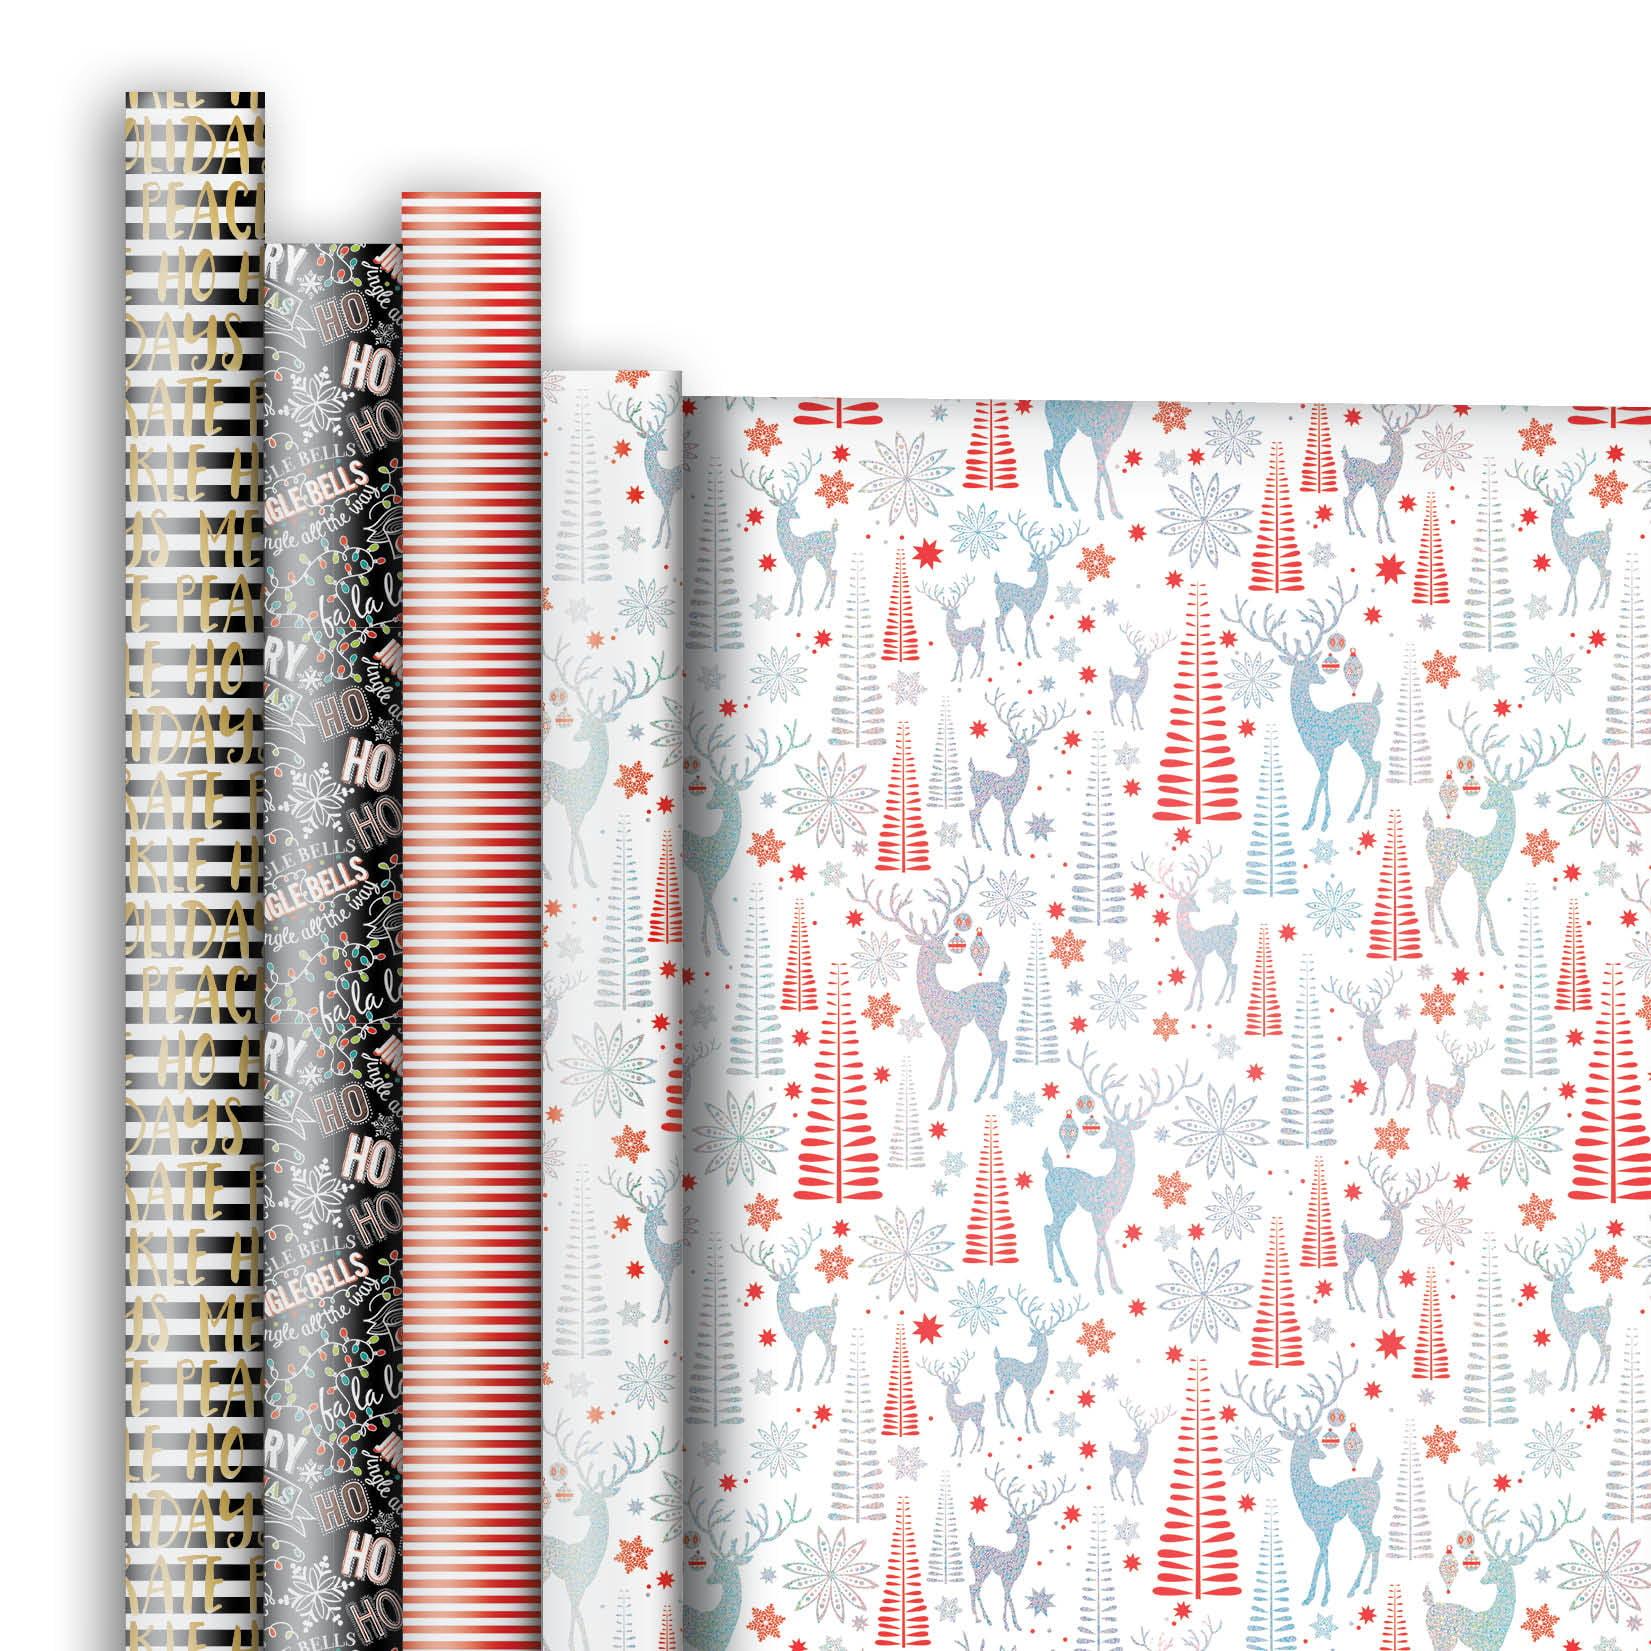 Jillson & Roberts Premium Gift Wrap Jumbo Roll Assortment, Christmas Designs (4 Rolls)